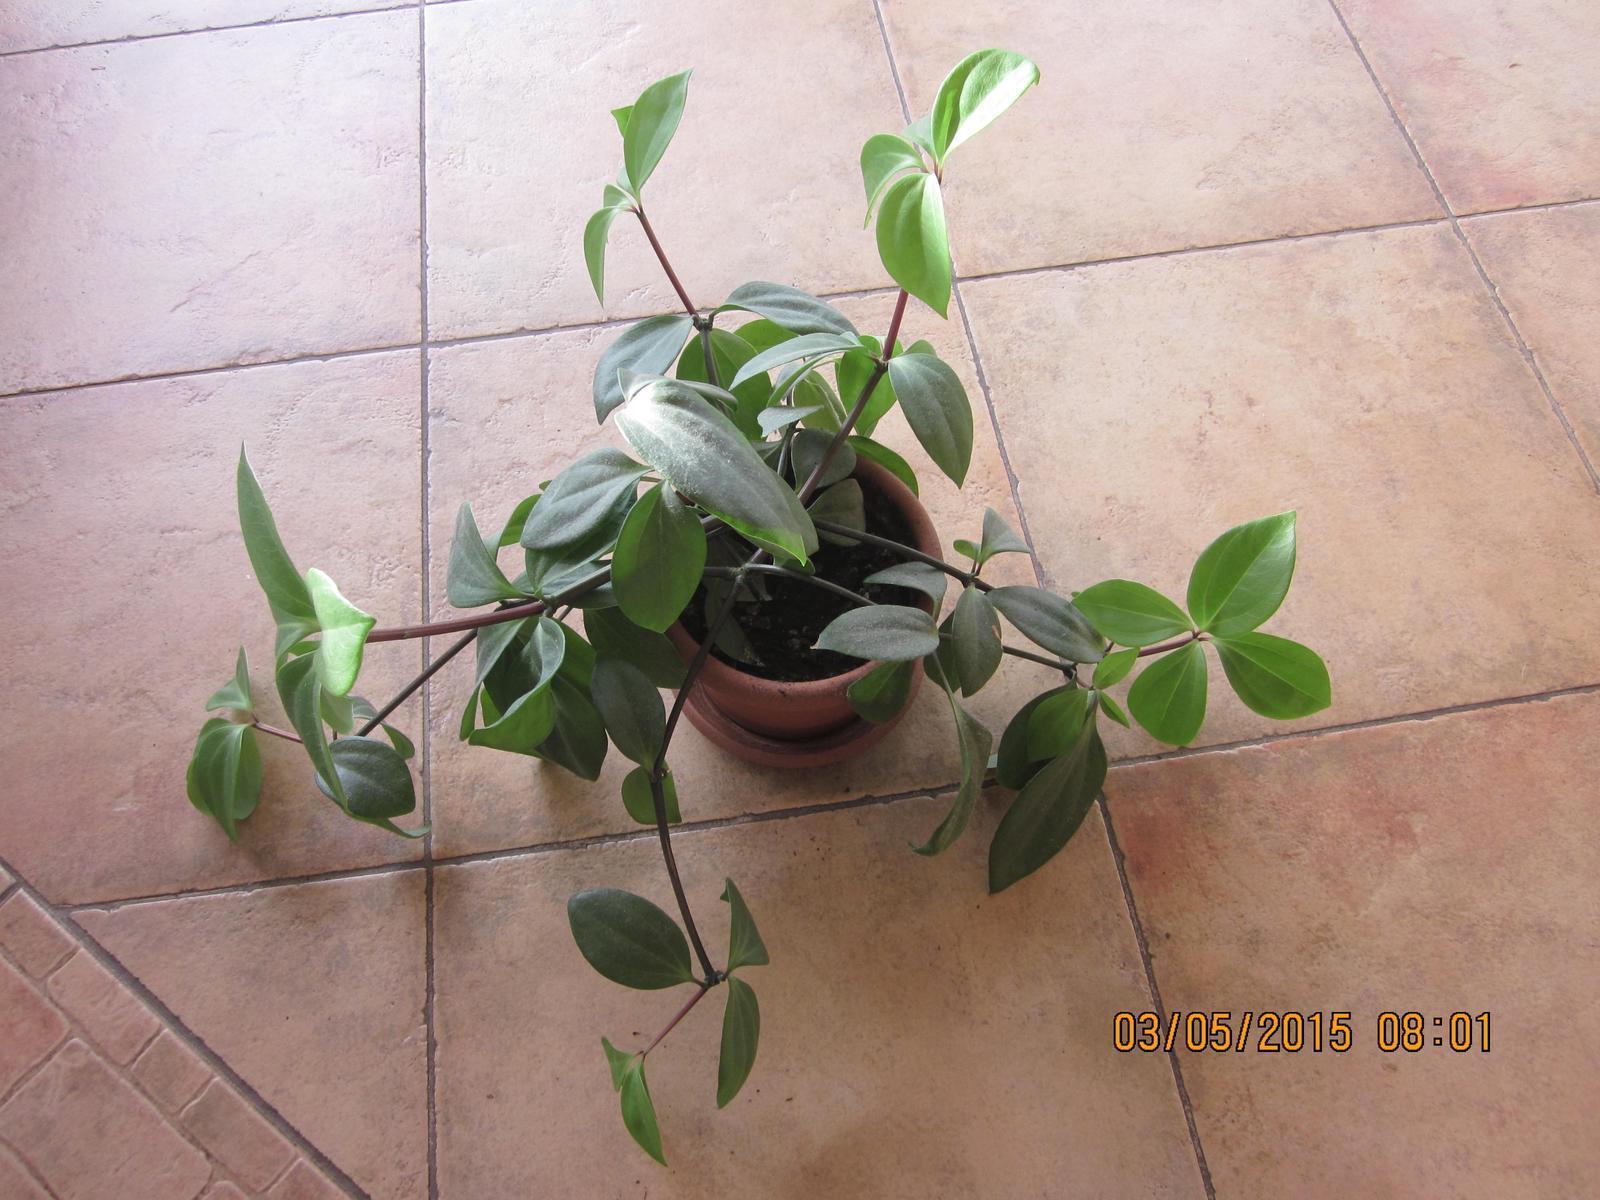 Izbovy kvet peperomia pereskifolia - Obrázok č. 1